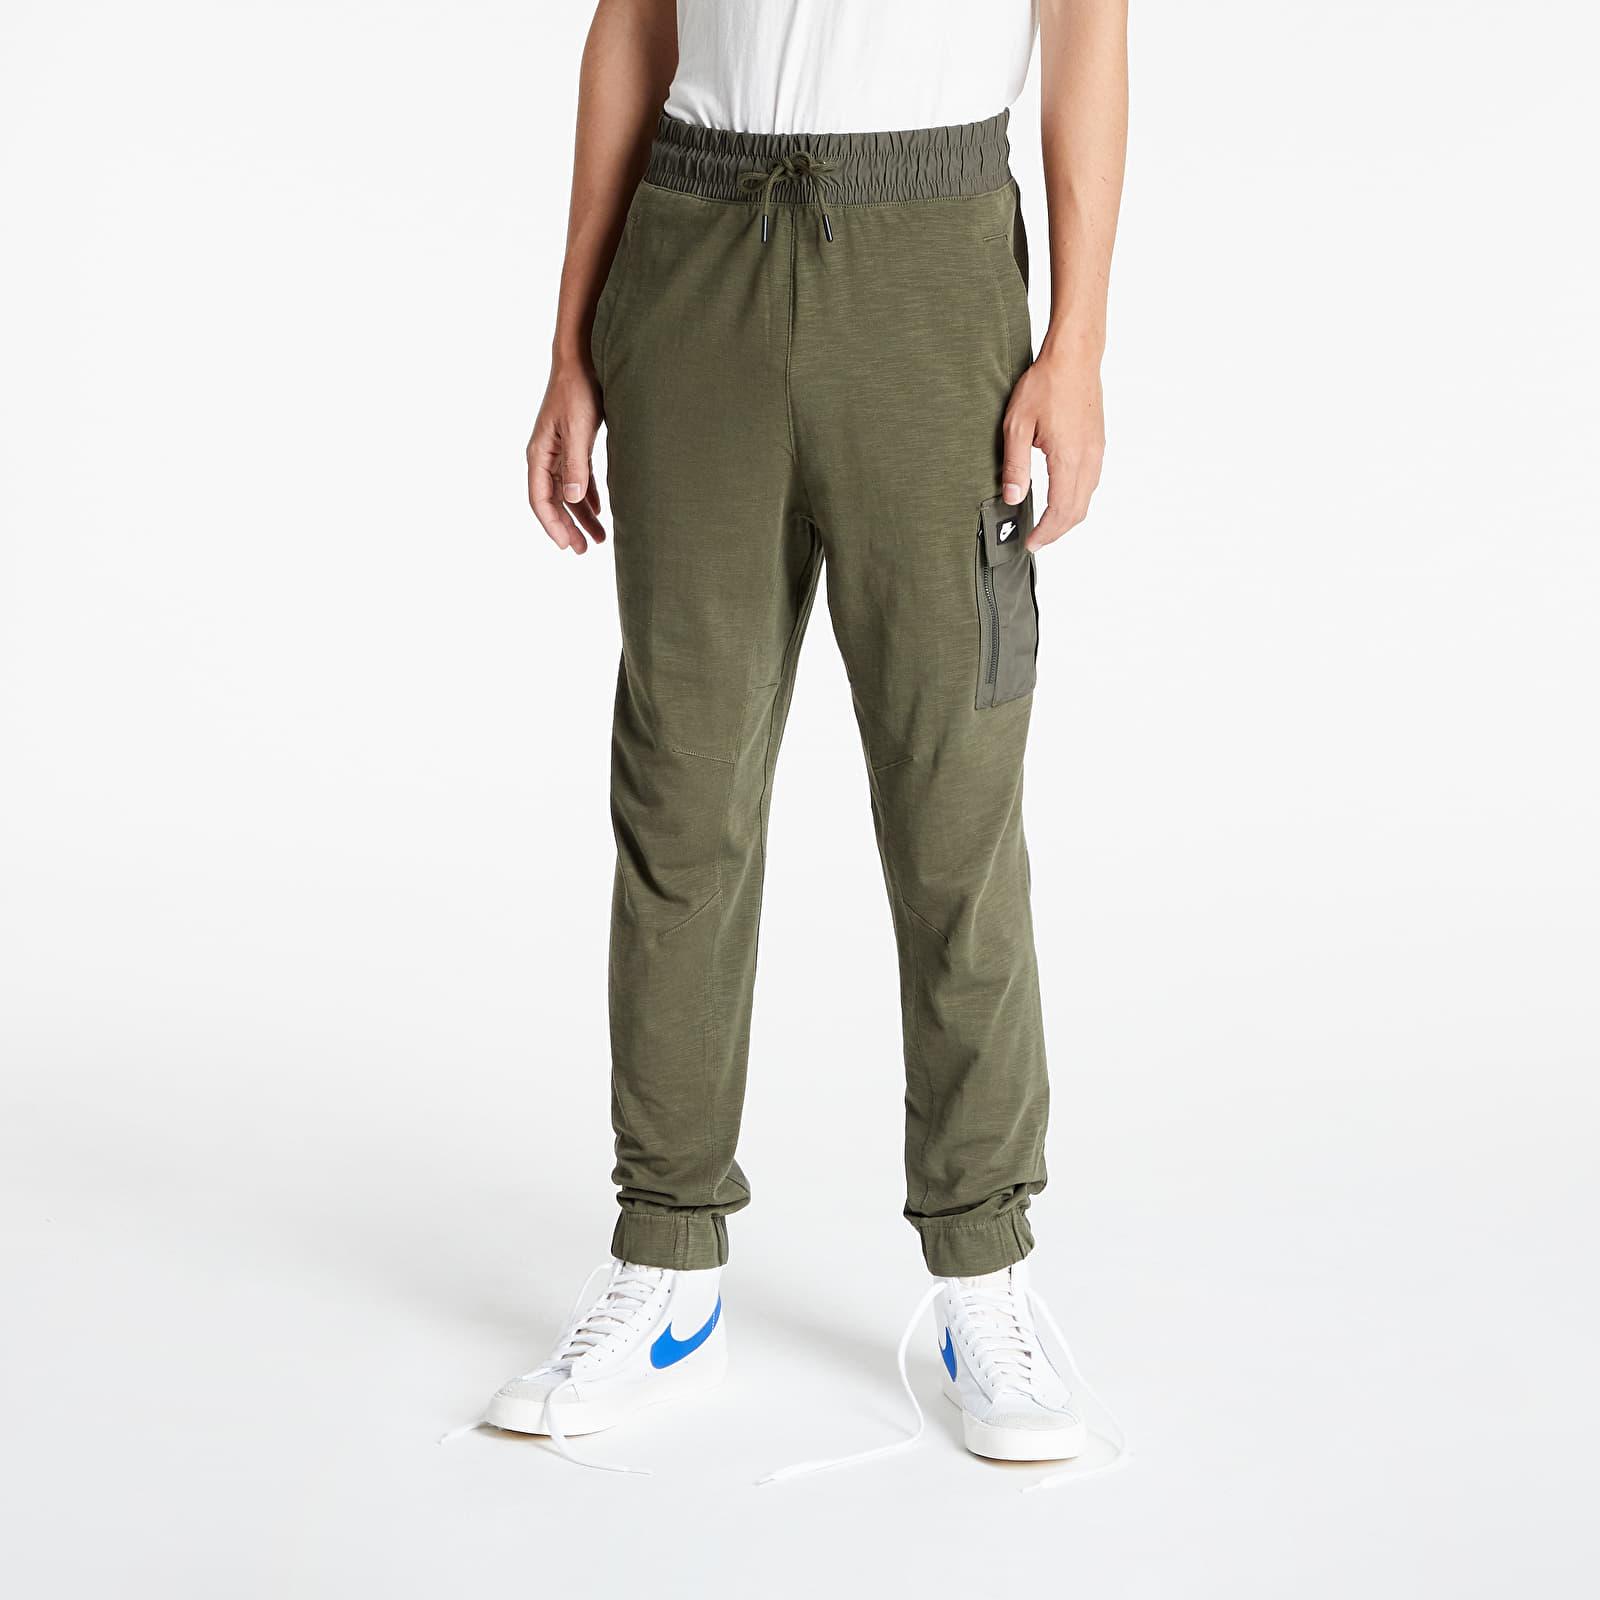 Nike Sportswear Me Pant Ltwt Essentials Cargo Khaki/ Cargo Khaki/ Black Oxidized